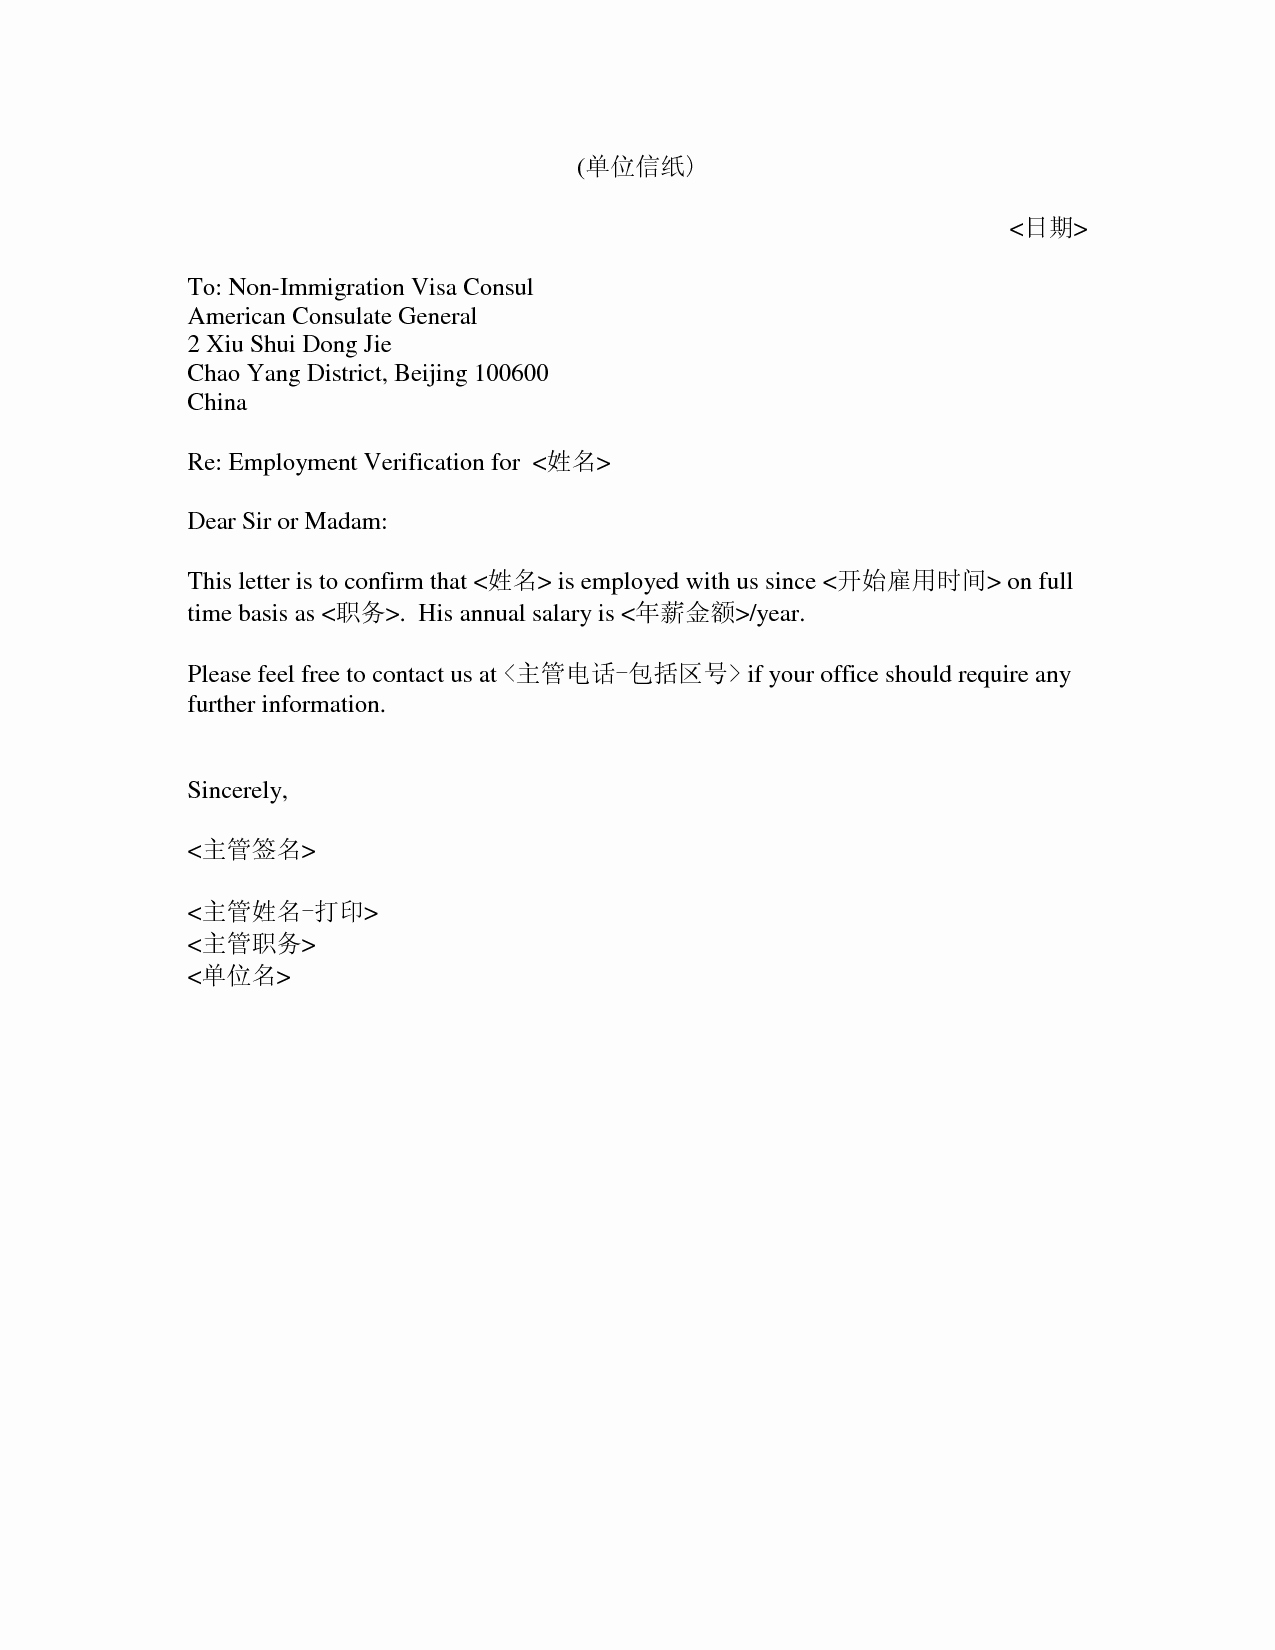 Employment Verification Letter for Immigration New Job Letter for Immigration